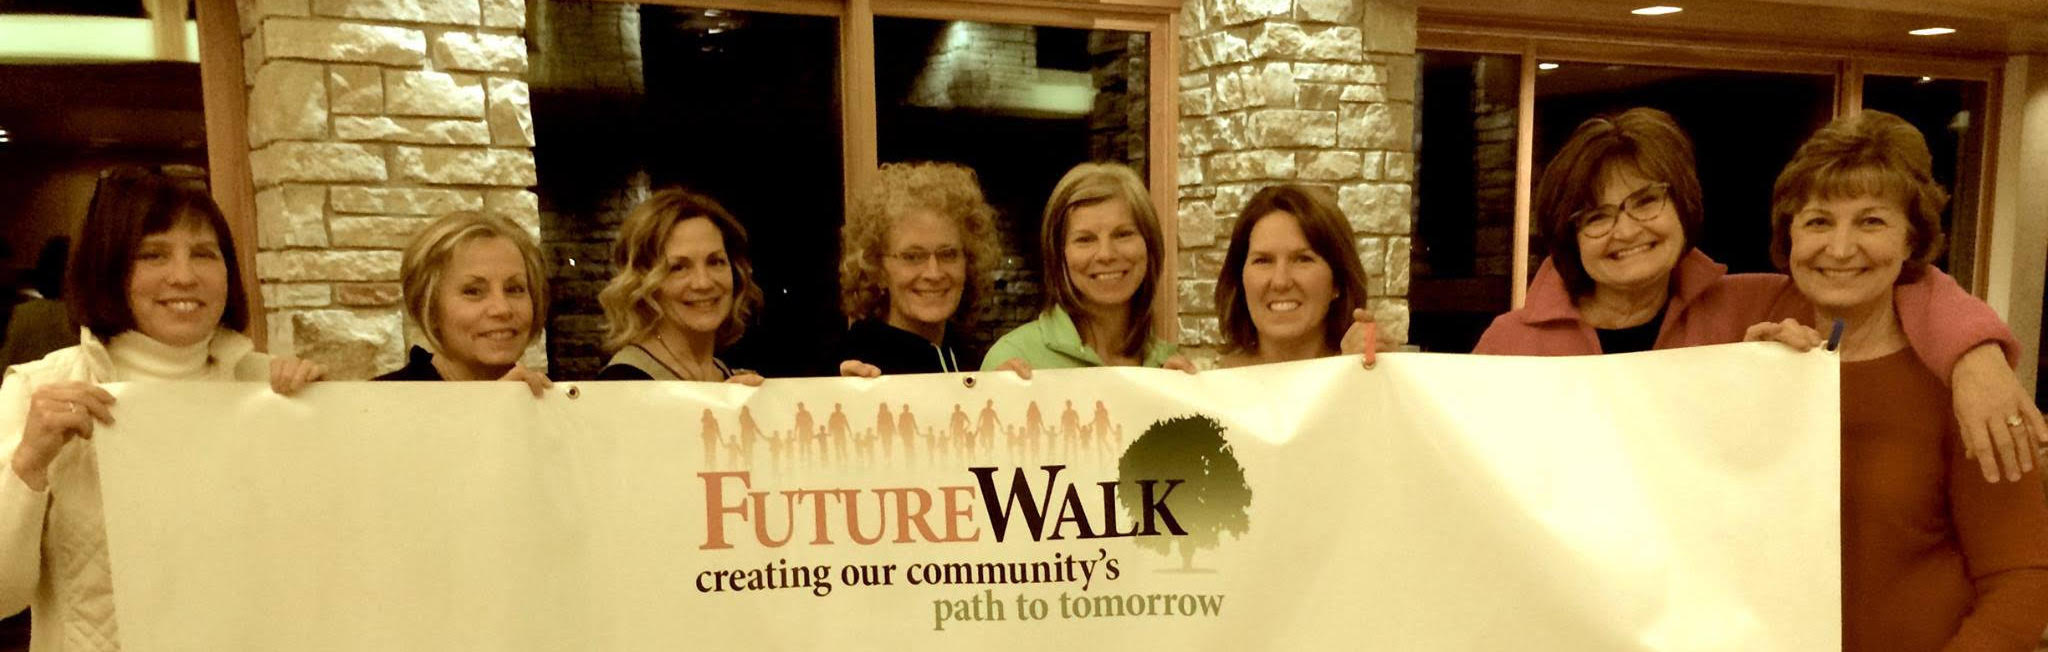 Chisago Lakes Chamber and Community Foundation FutureWalk